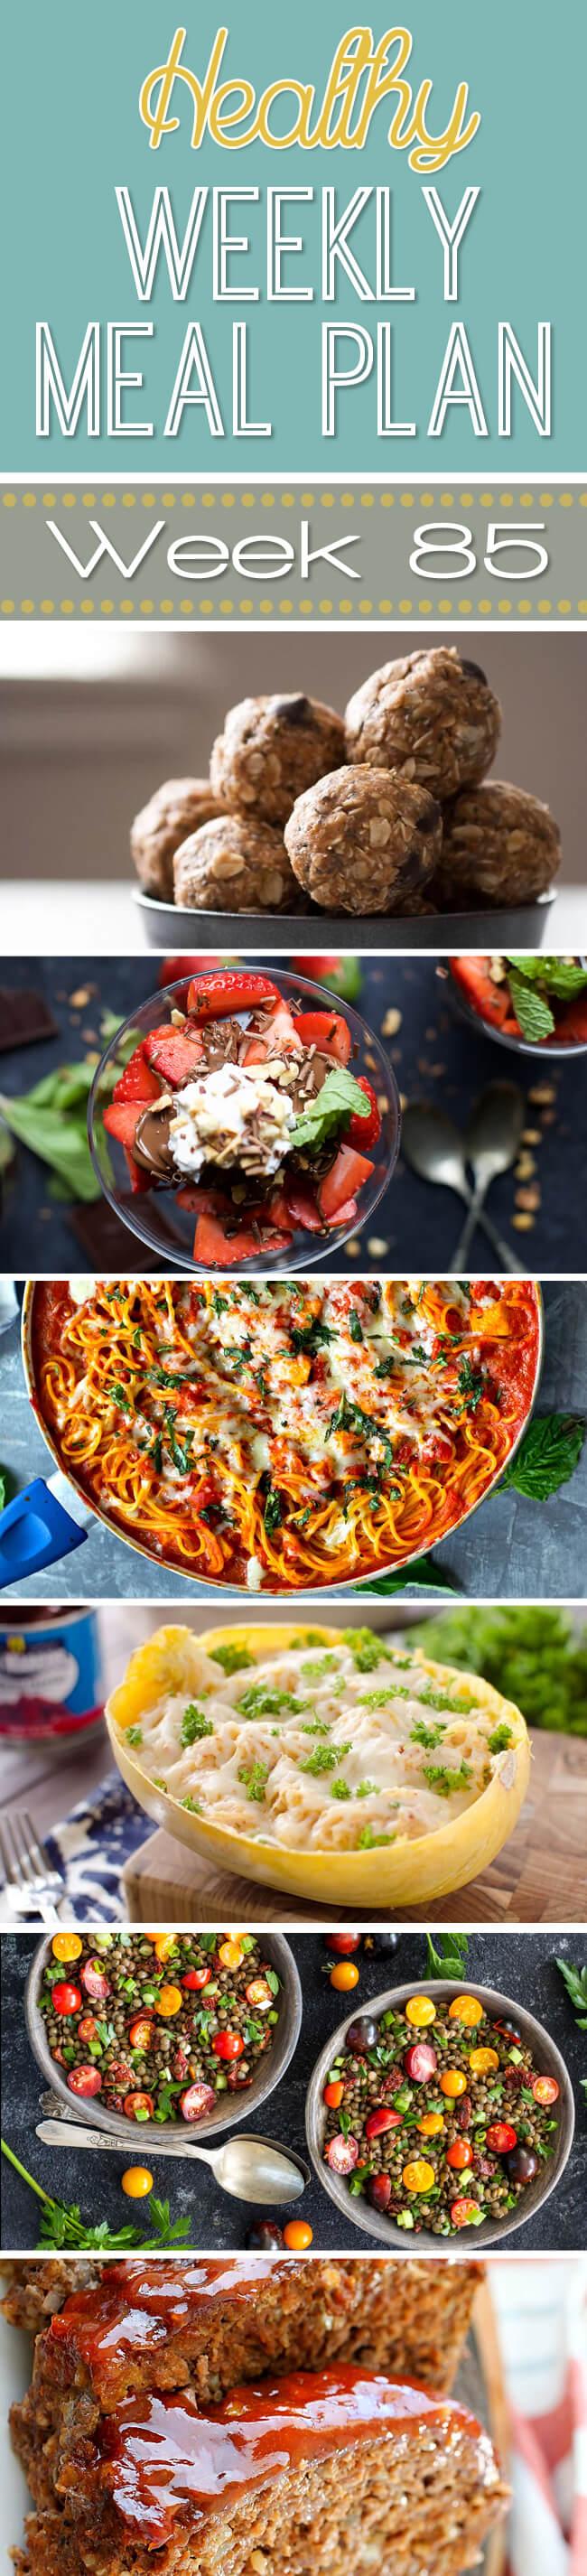 Healthy Weekly Meal Plan #85